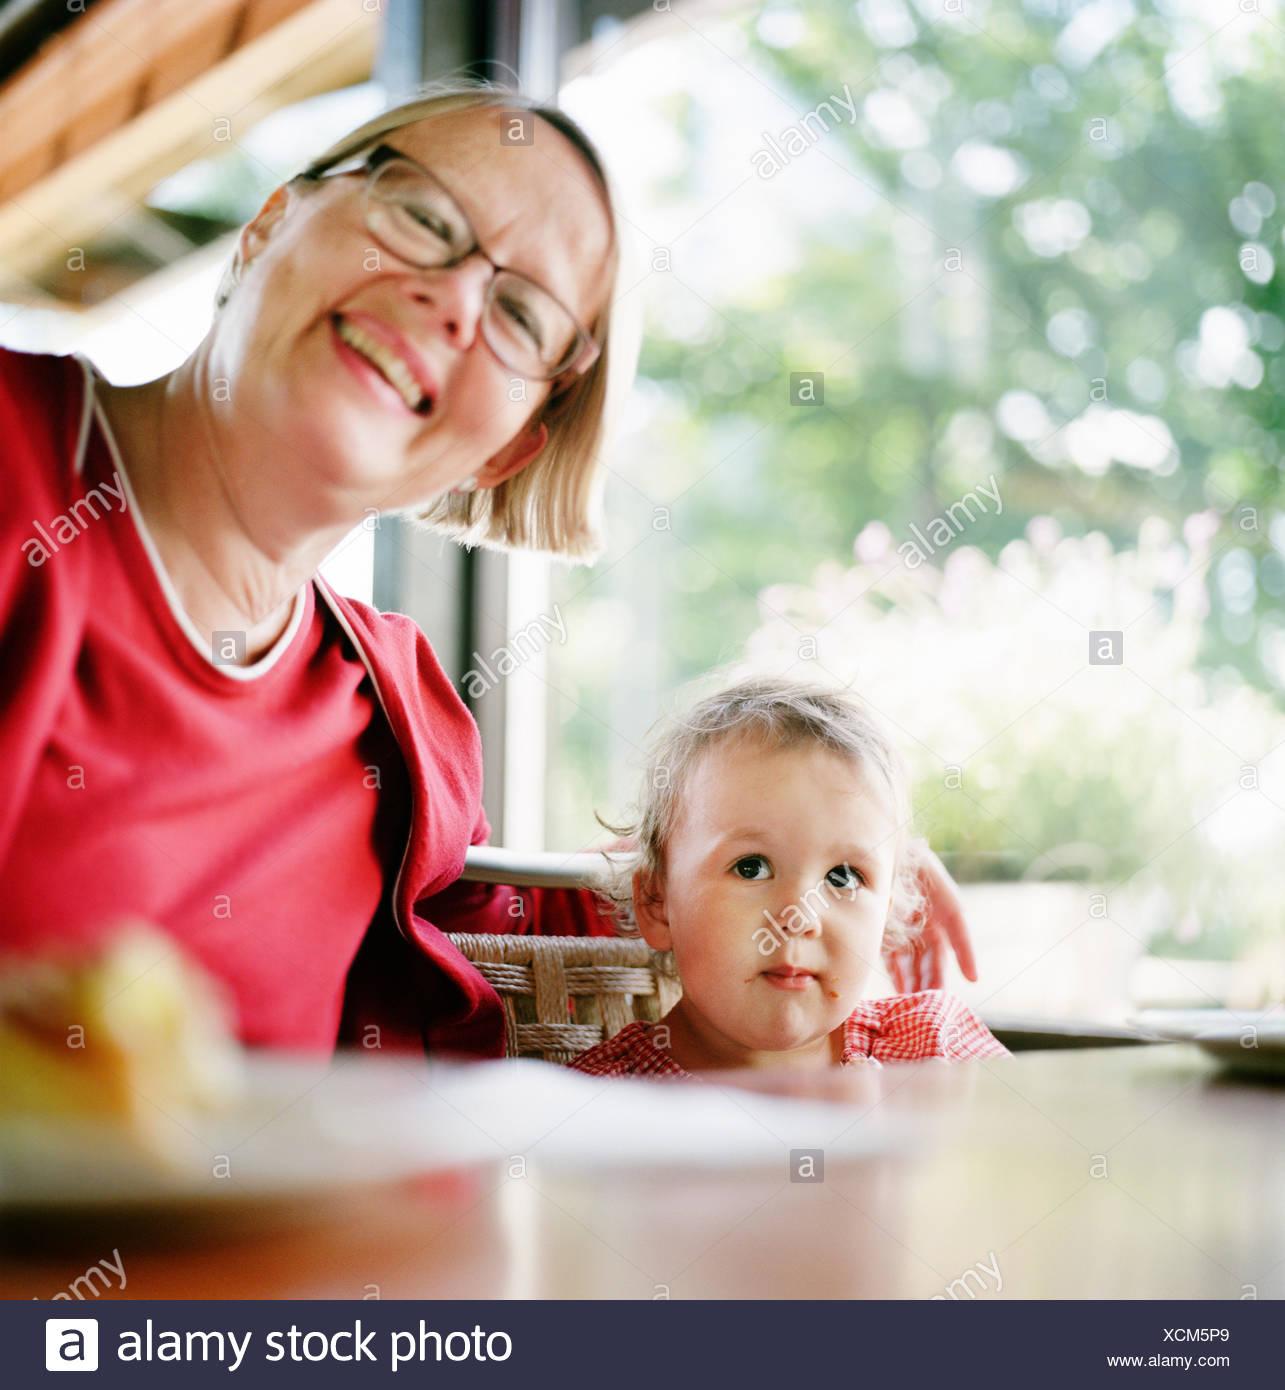 Finlandia, Helsinki, Uusimaa, retrato de la abuela con su nieta (2-3) Imagen De Stock